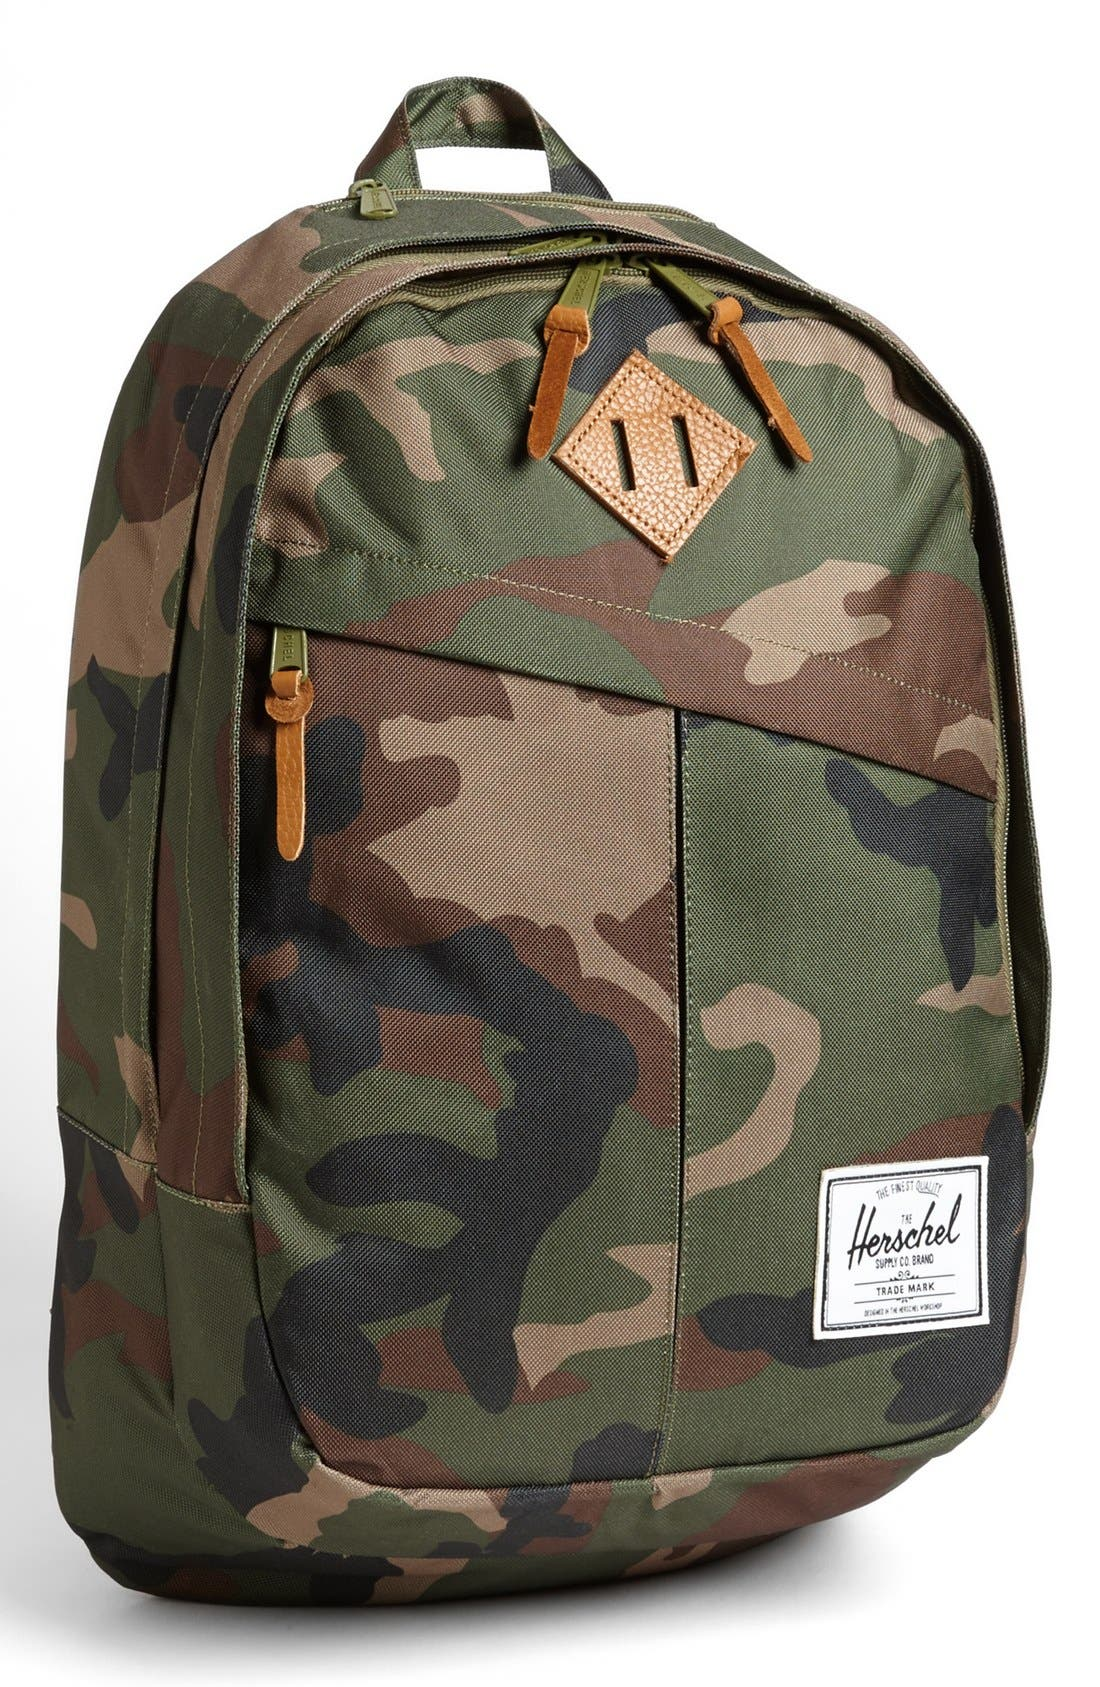 Alternate Image 1 Selected - Herschel Supply Co. 'Sierra' Backpack